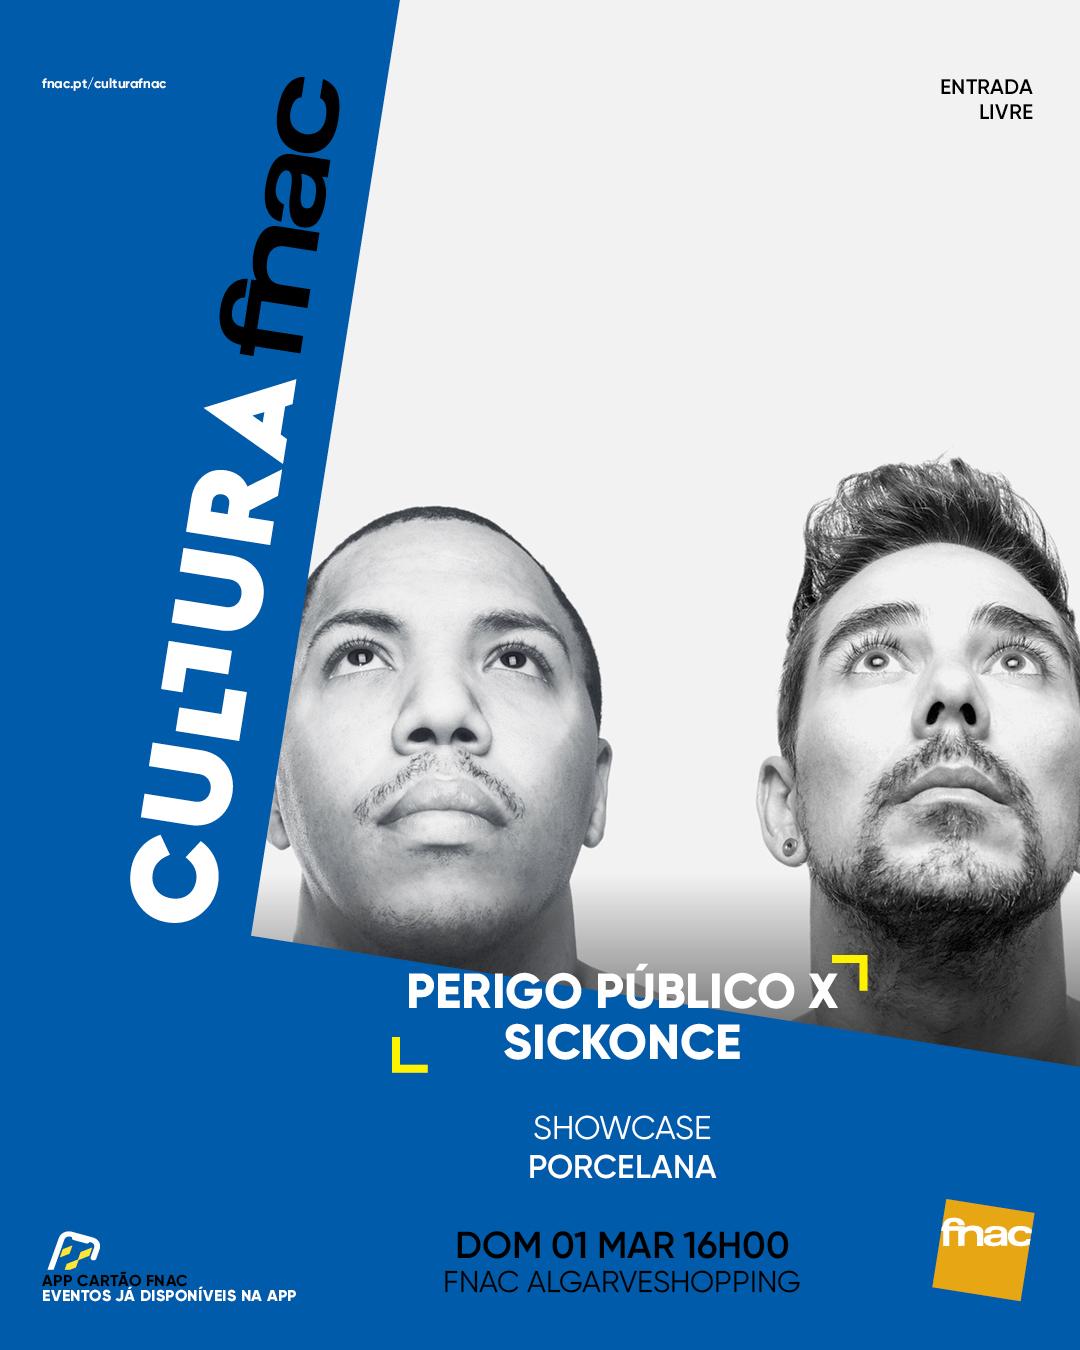 Perigo Público & Sickonce (showcase) | Porcelana